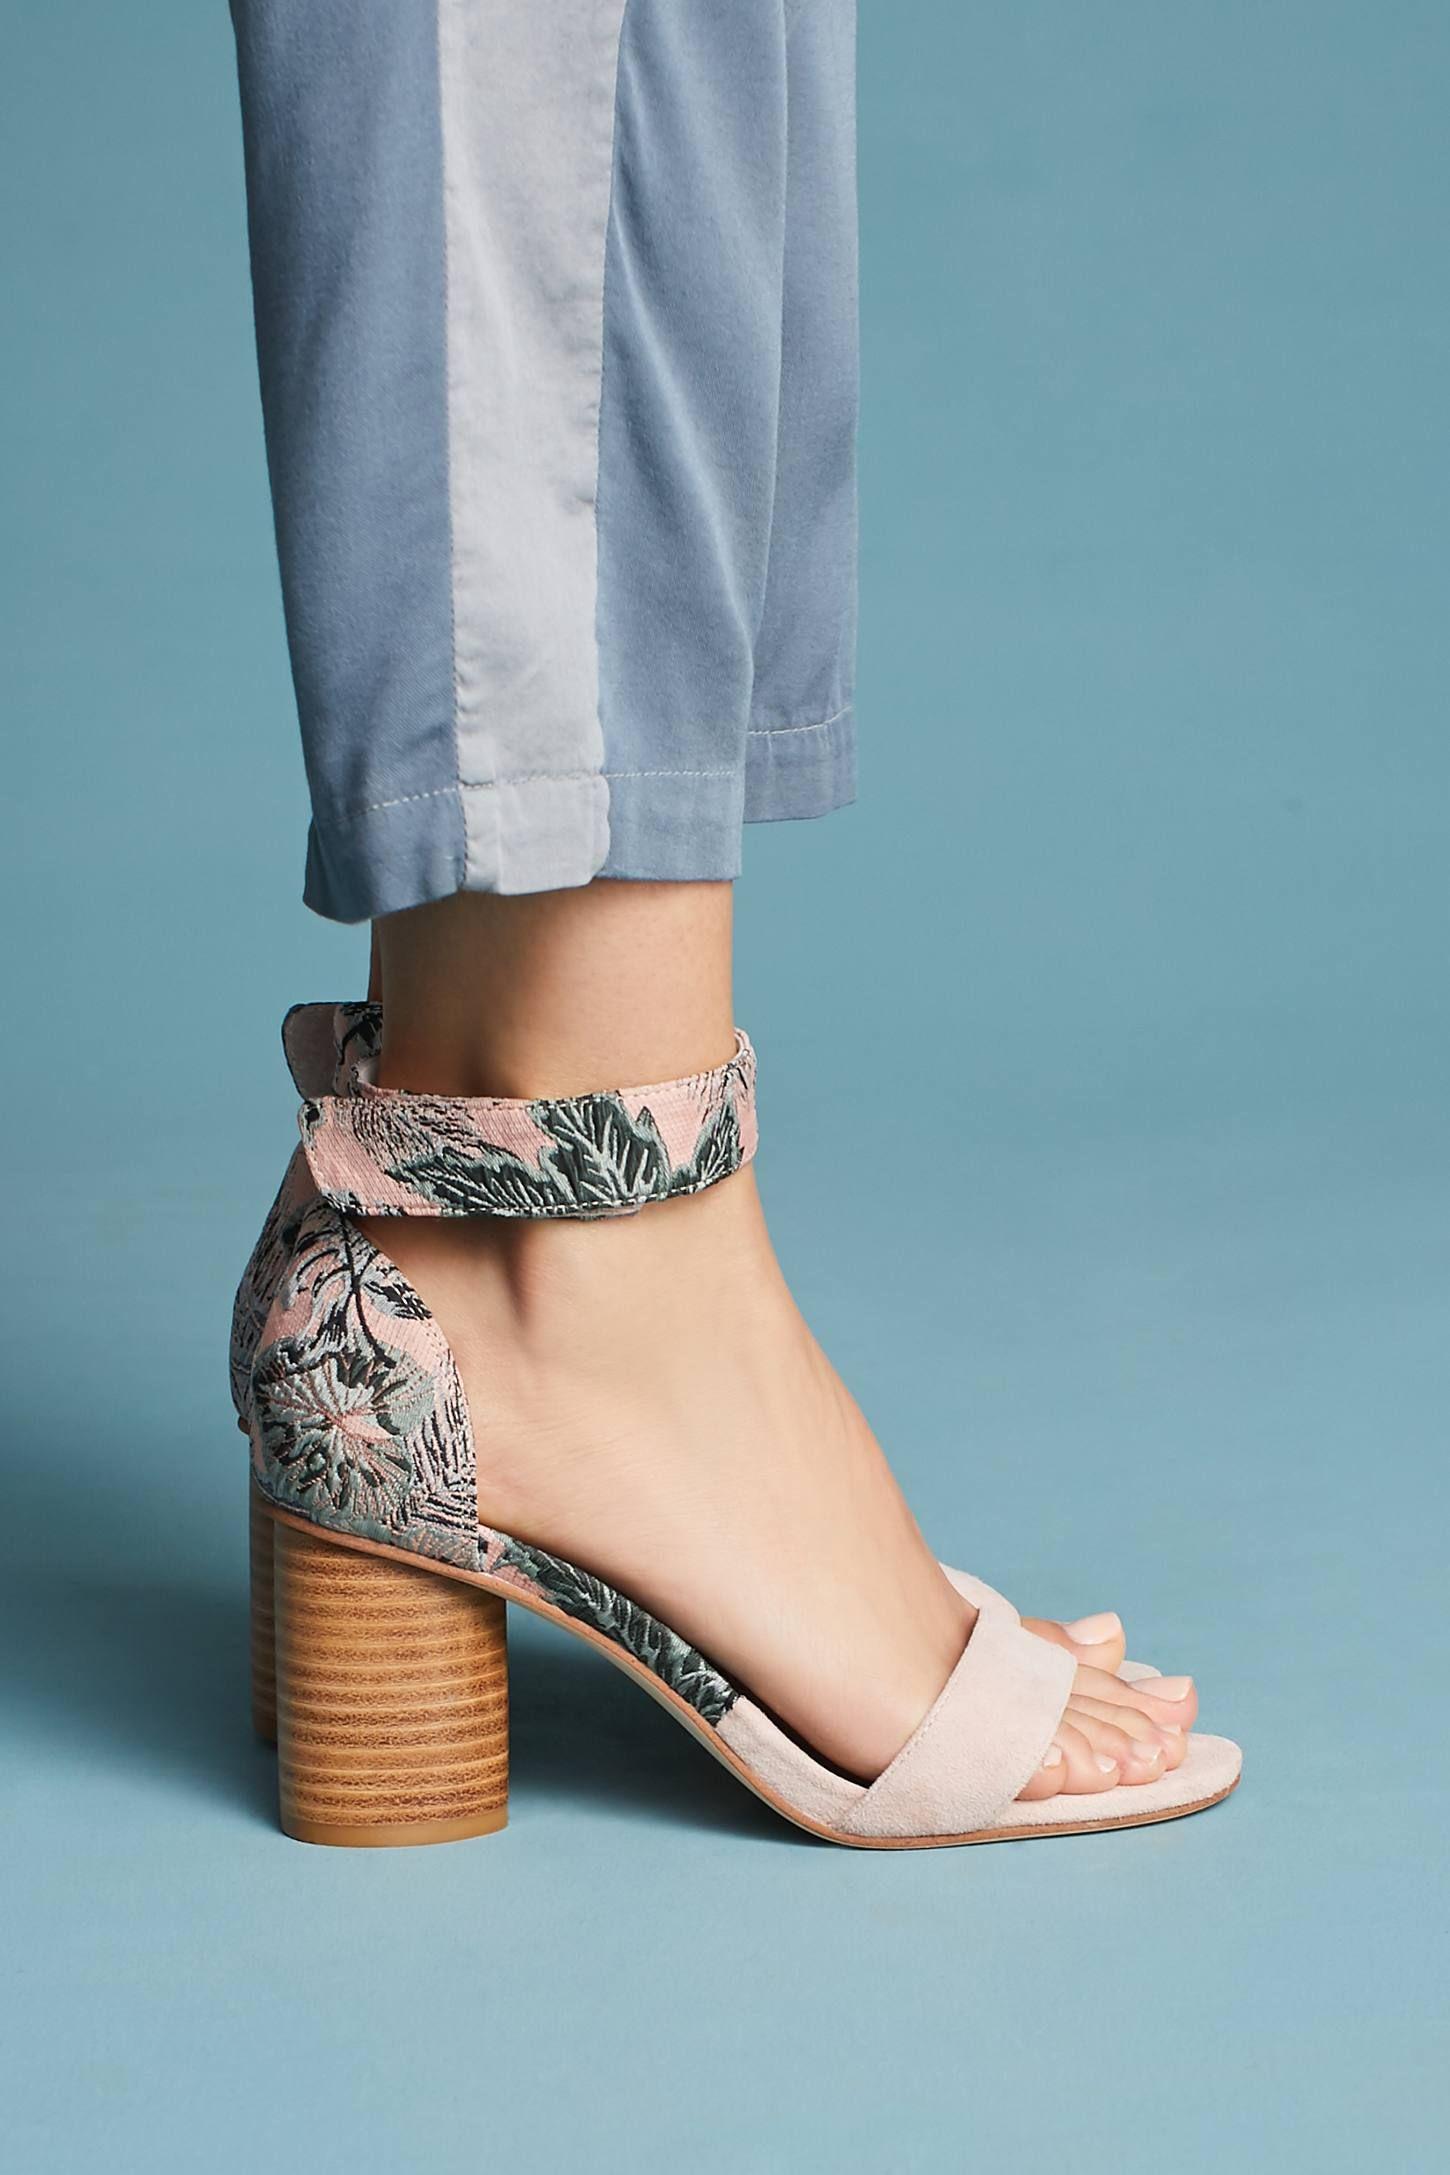 Jeffrey Campbell Purdy Heels Summer shoes, Fashion heels